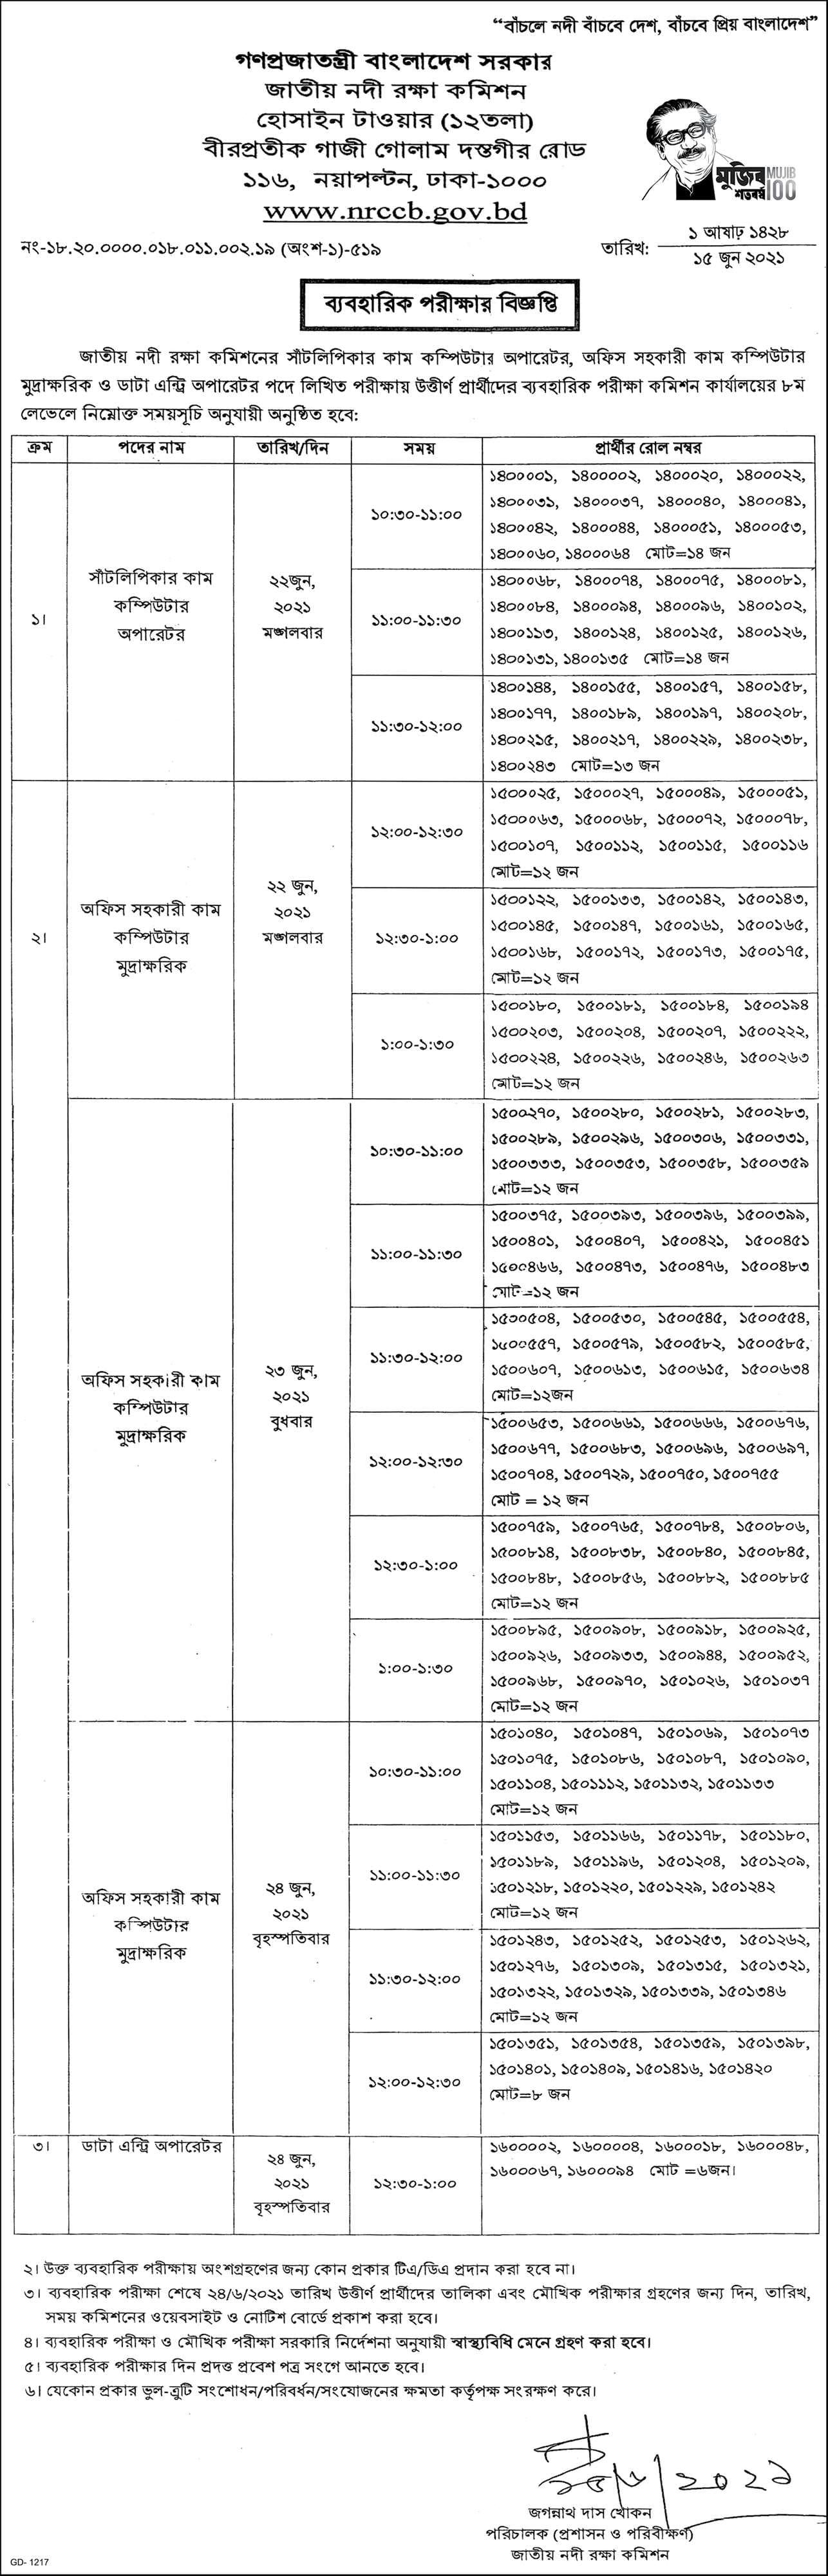 NRCCB Practical Exam Date 2021